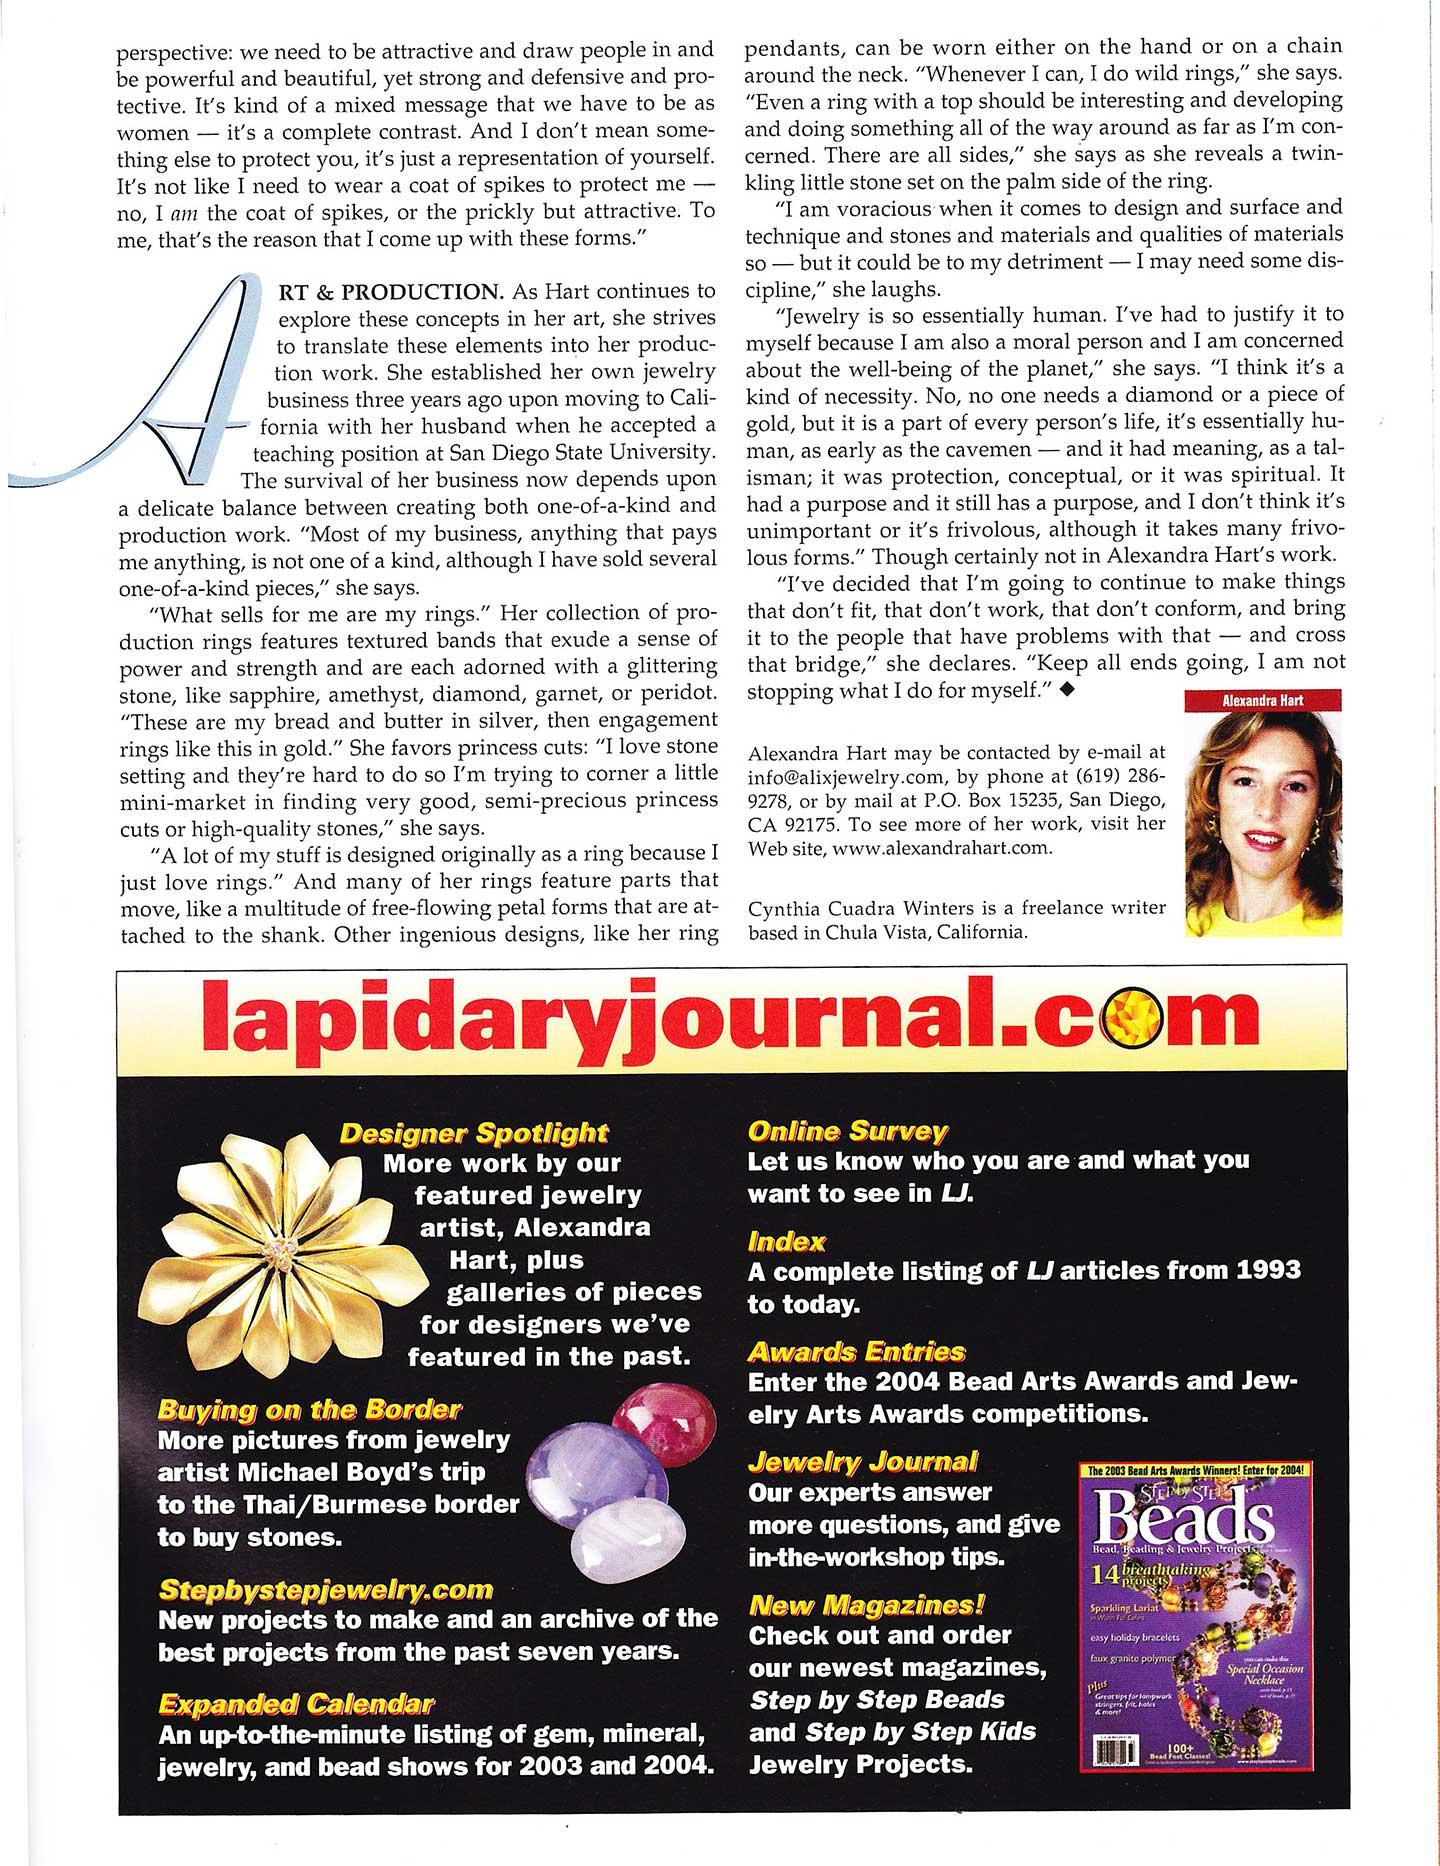 LapidaryJournal-Nov2003-86